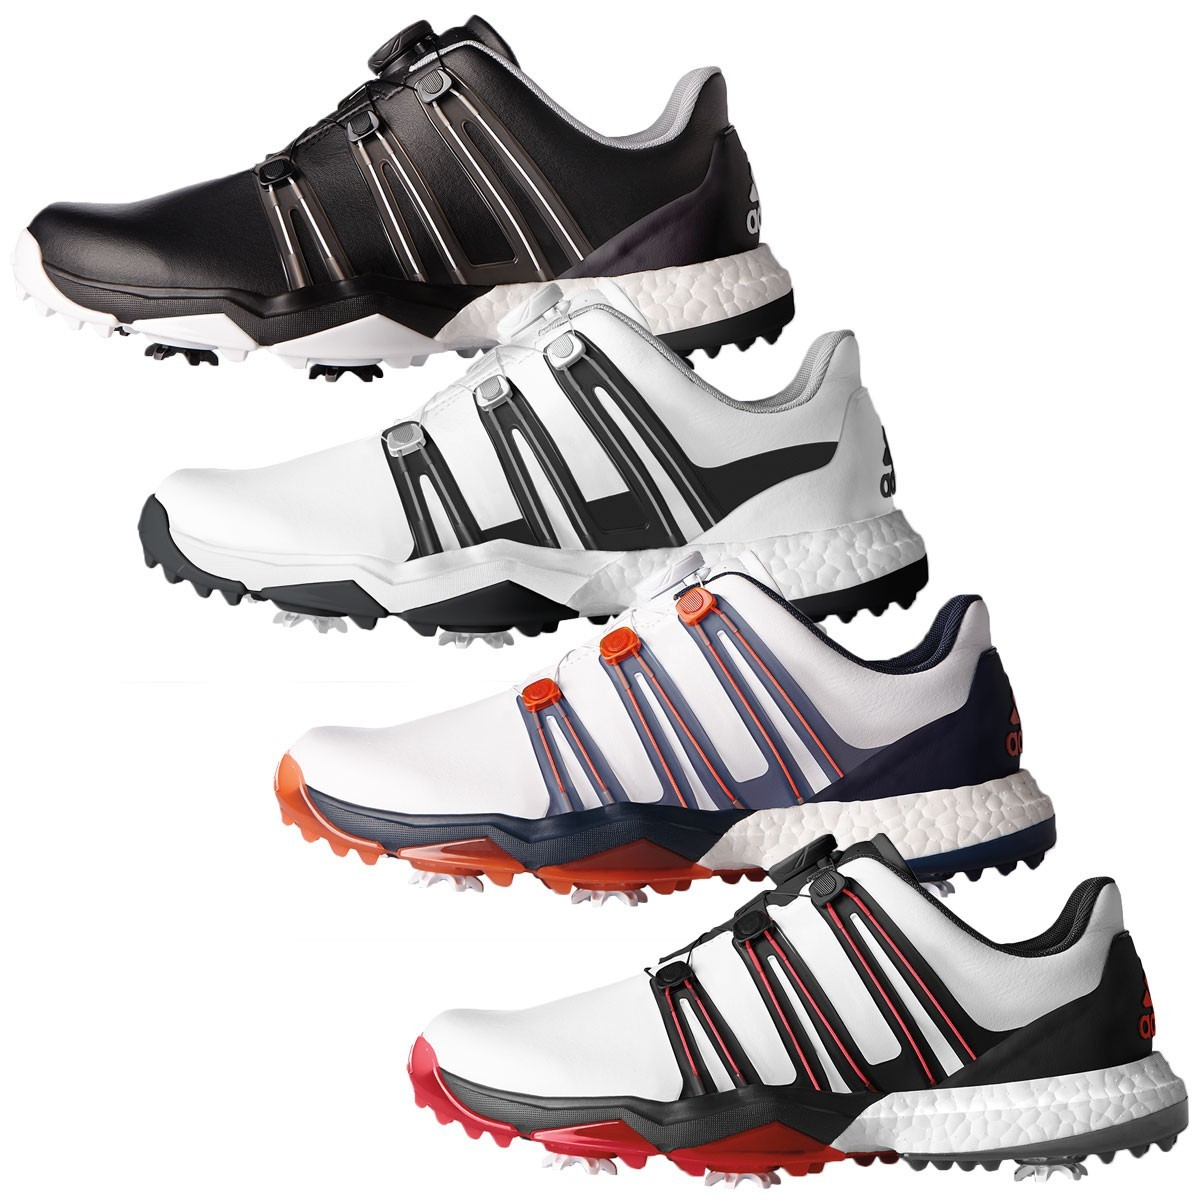 Adidas Golf  Powerband Boa Boost Wd Waterproof Golf Shoes